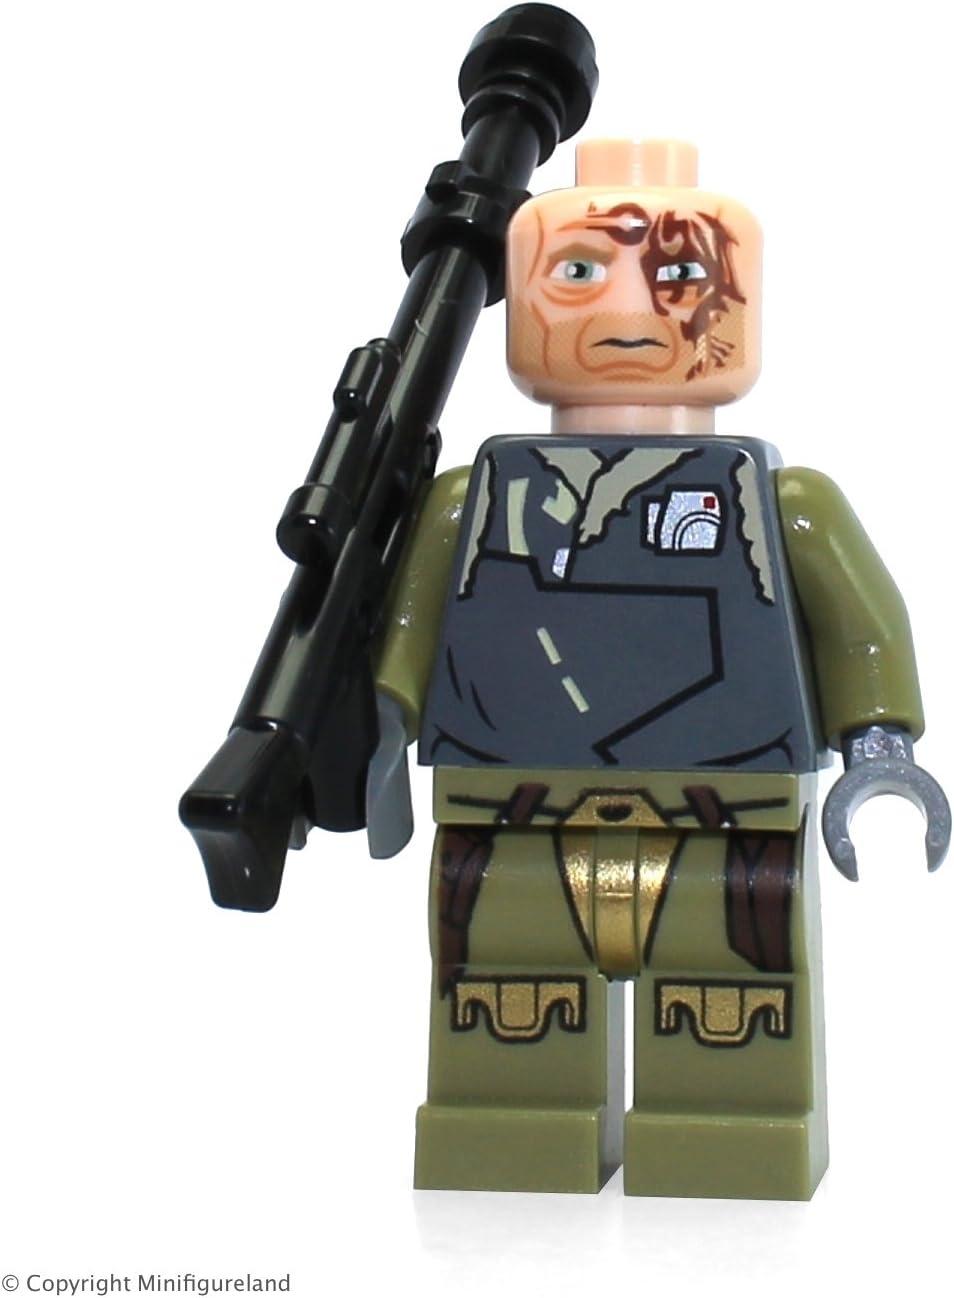 Lego Star Wars Obi-Wan Kenobi Rako Hardeen Bounty Hunter Disguise Minifigure (2013)